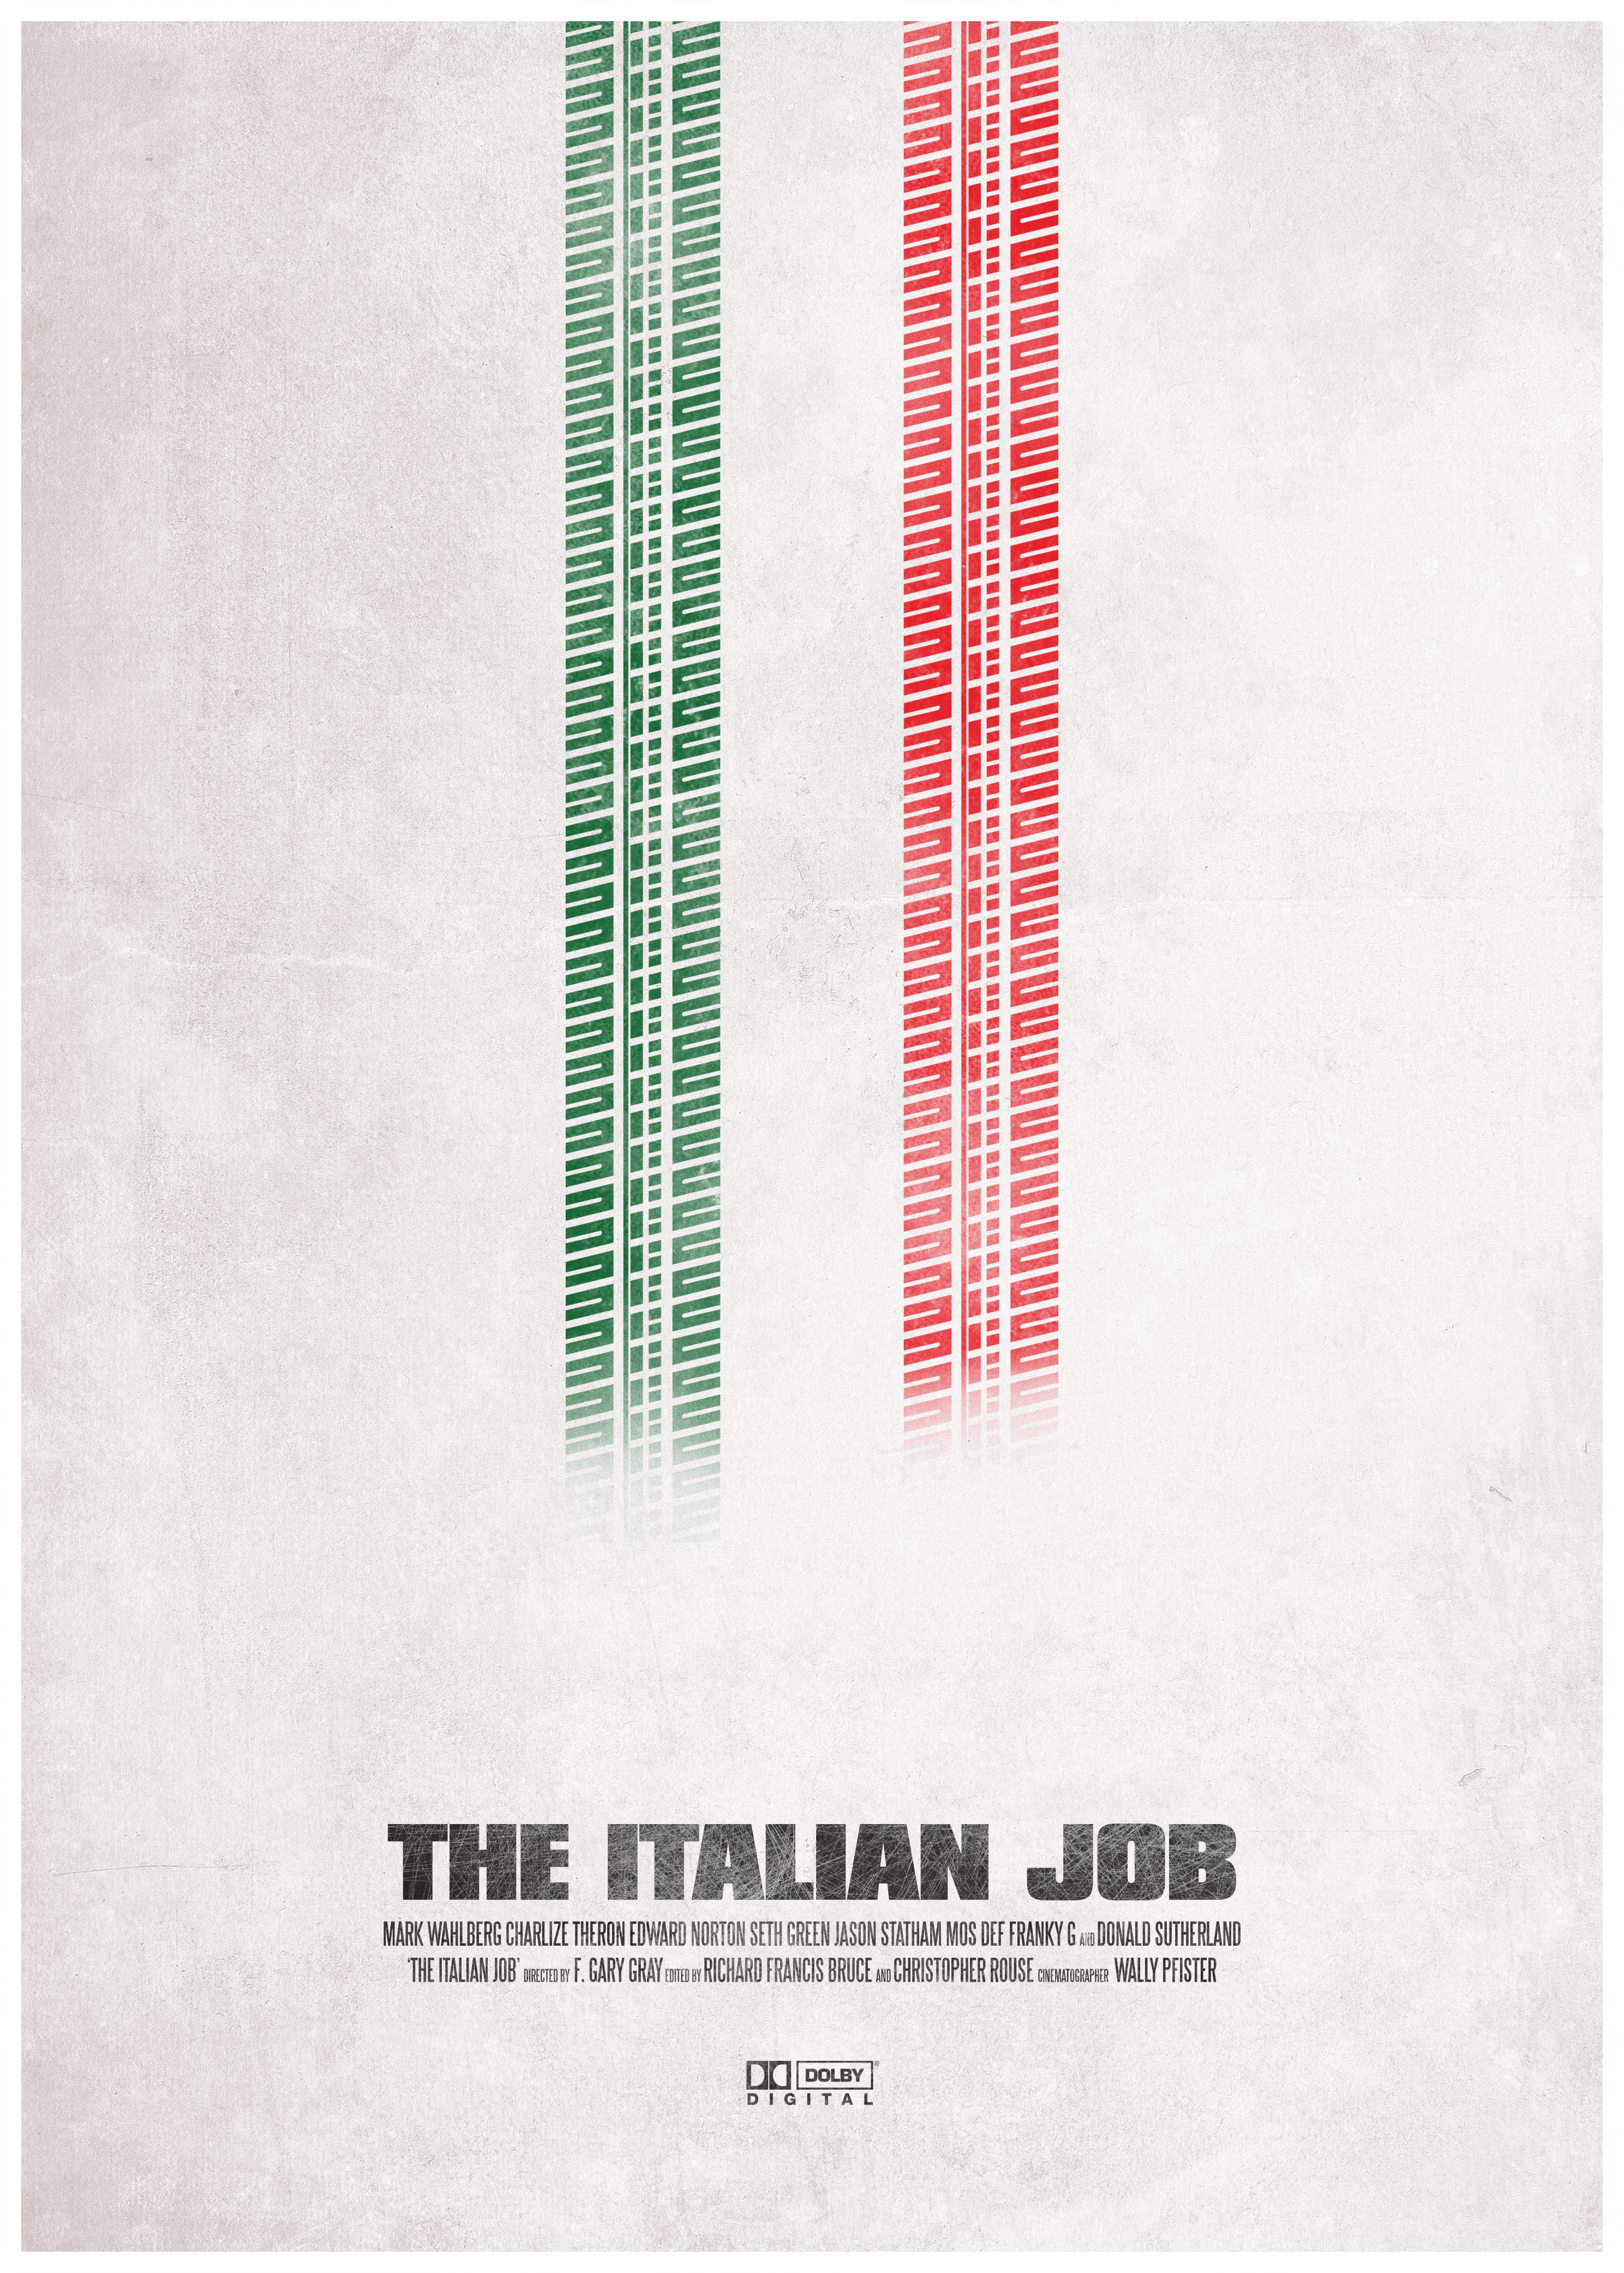 content/images/minimal-poster/TheItalianJobPrint.jpg